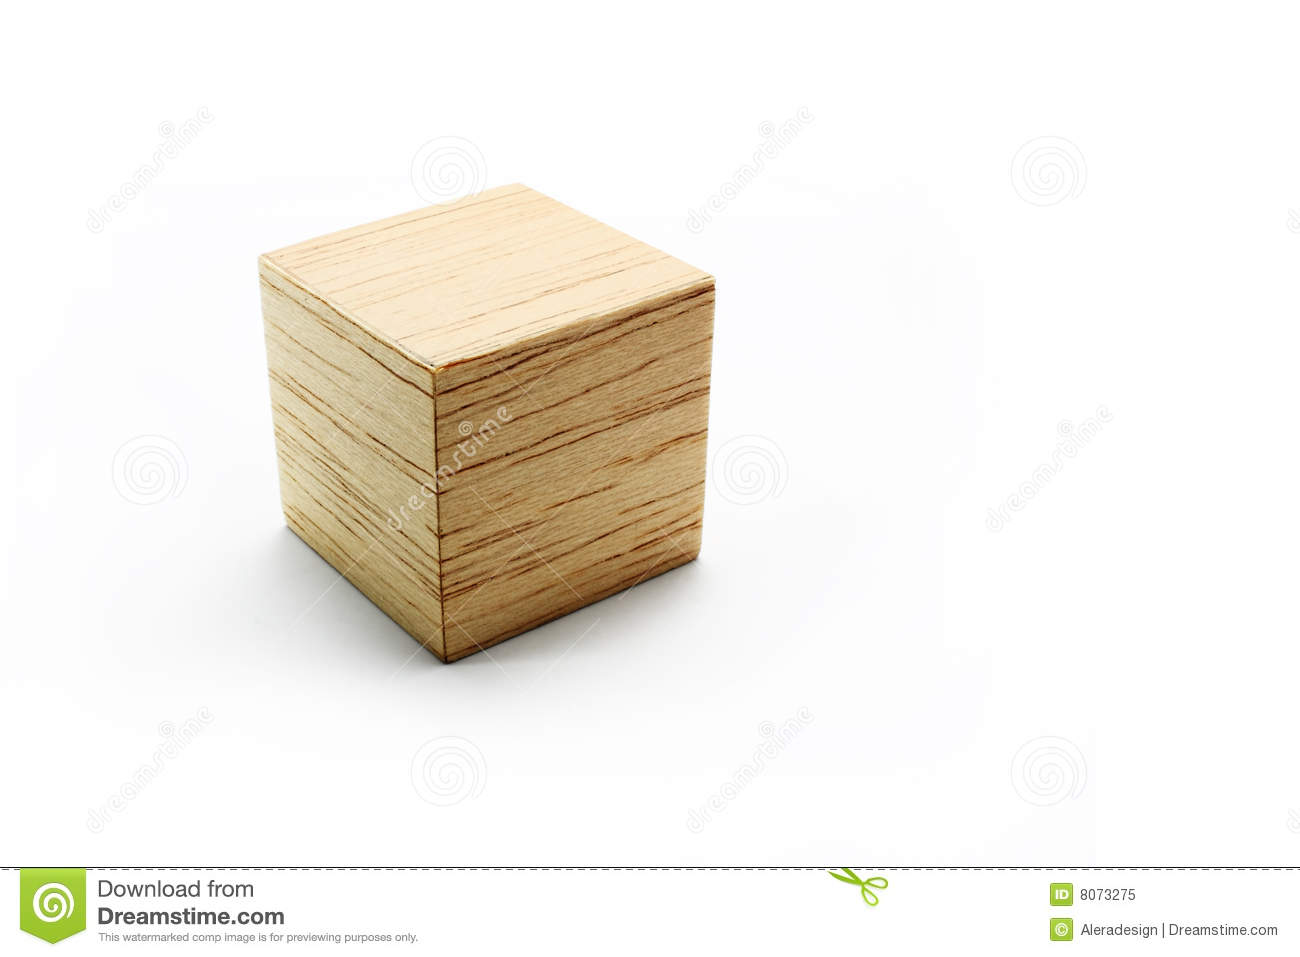 Wood clipart wood block Wood Stock Wooden block Image: